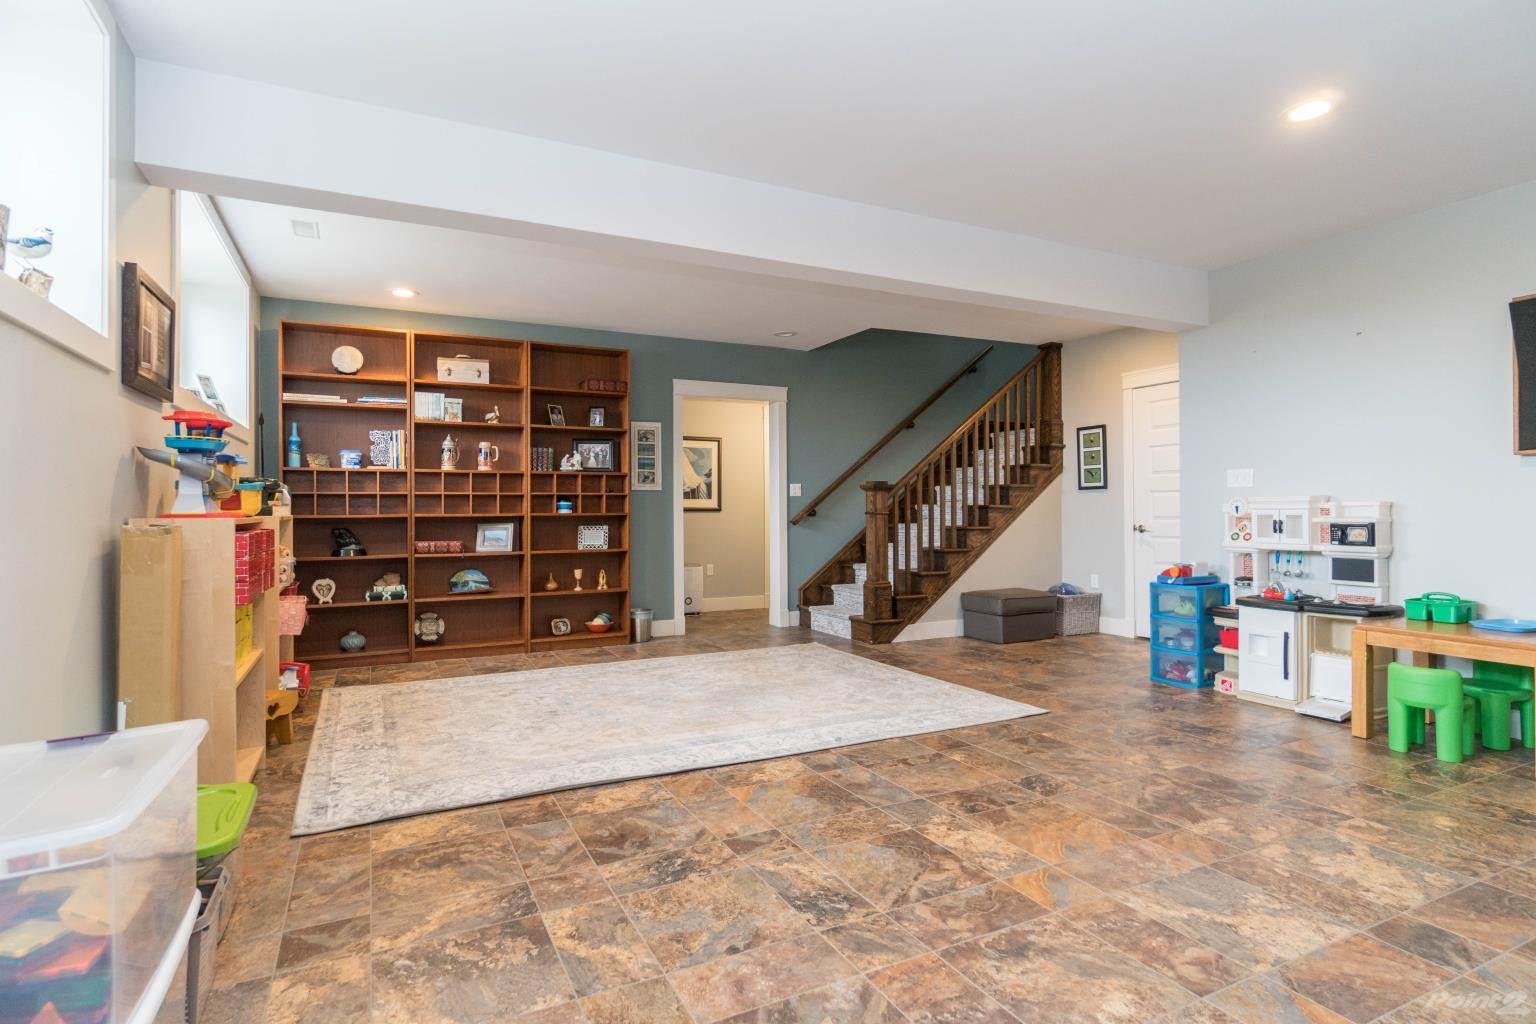 Donaldston Rd in Donaldston - House For Sale : MLS# null Photo 24